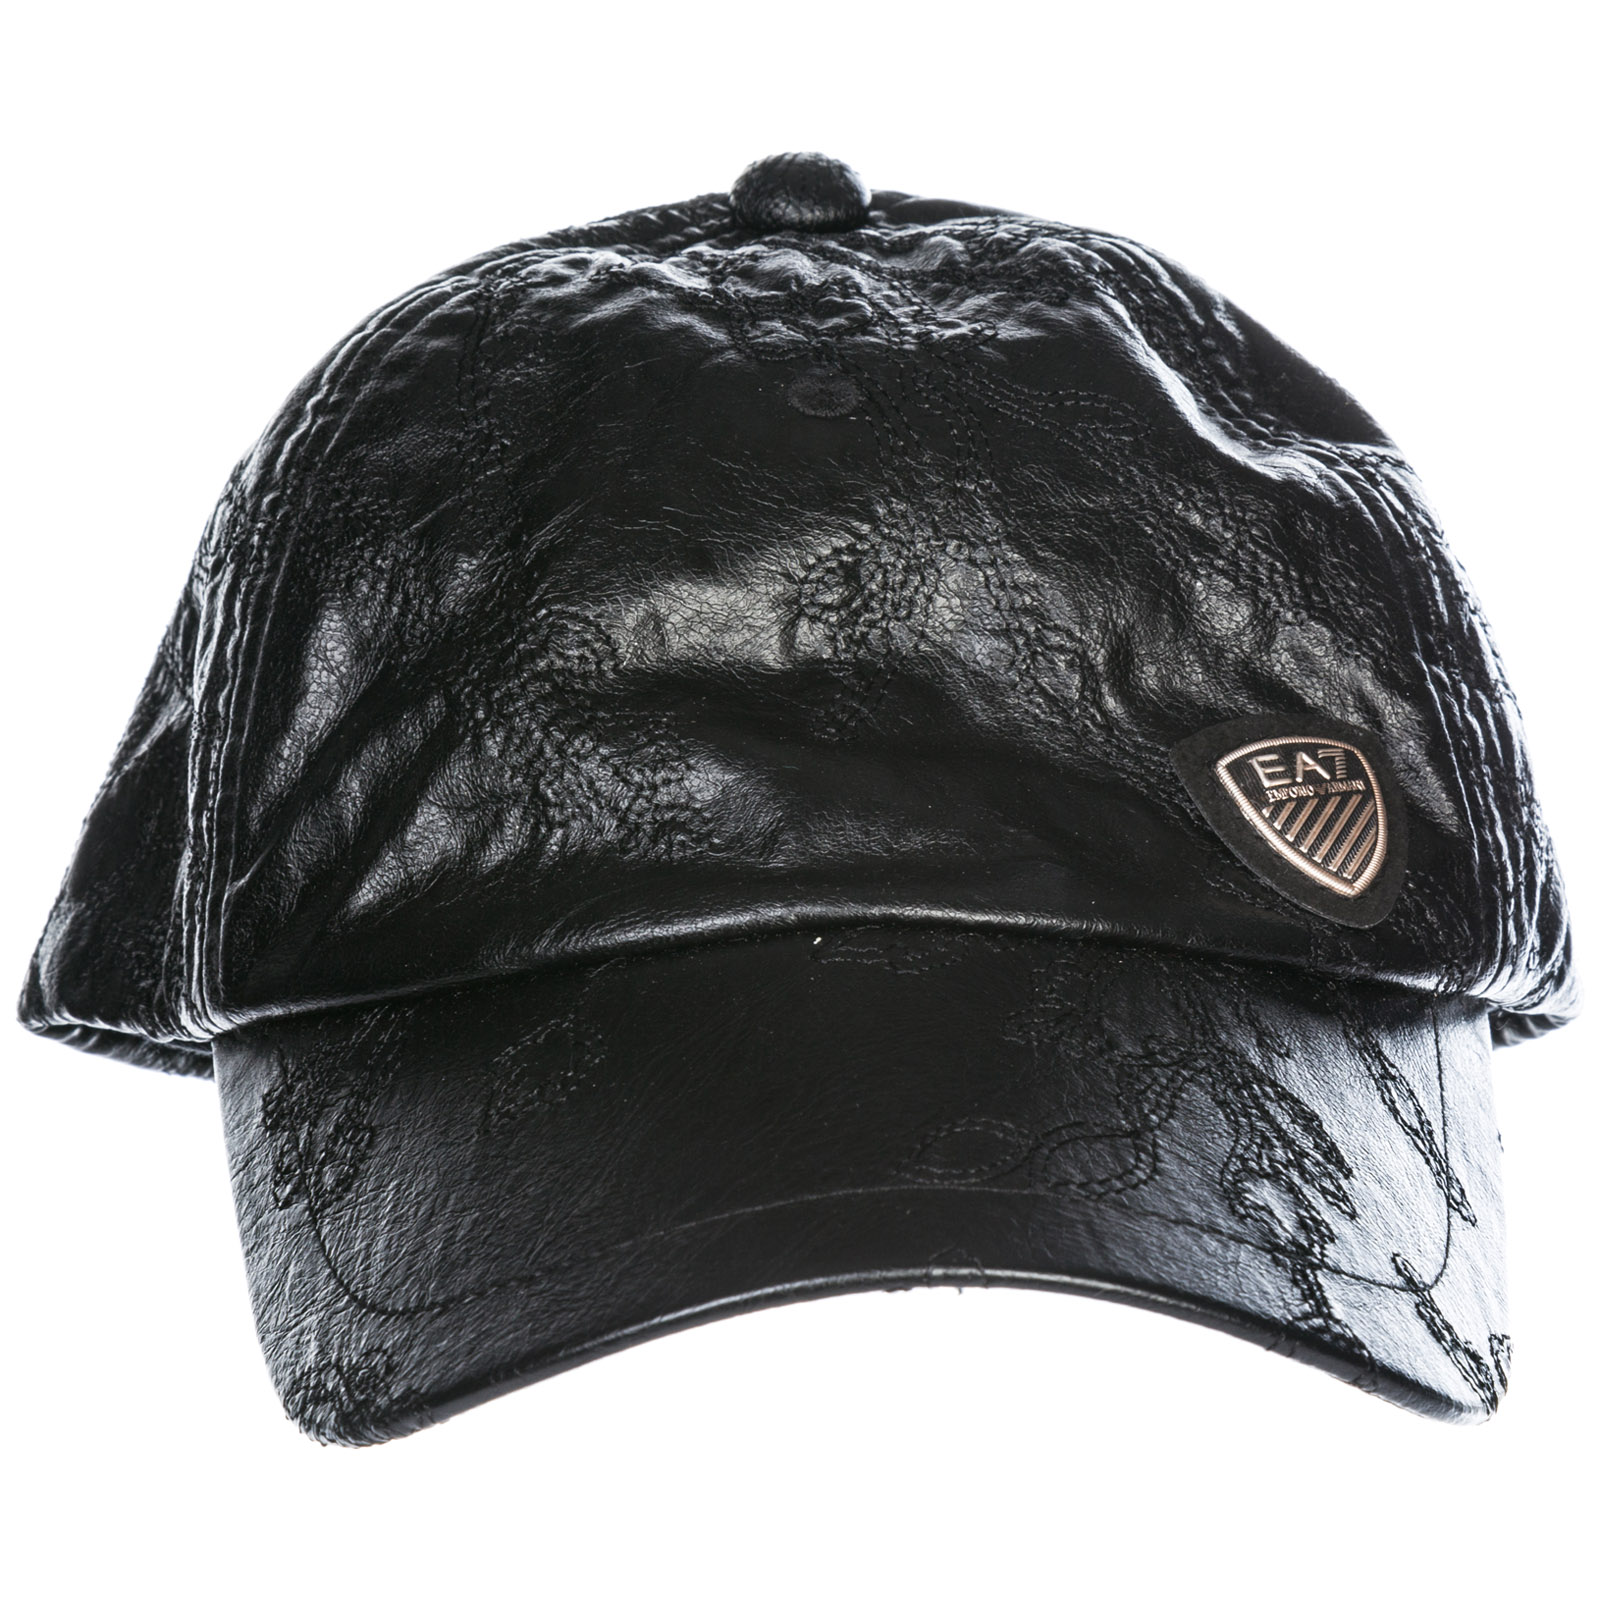 61c563d5803 Adjustable women s hat baseball cap Adjustable women s hat baseball ...